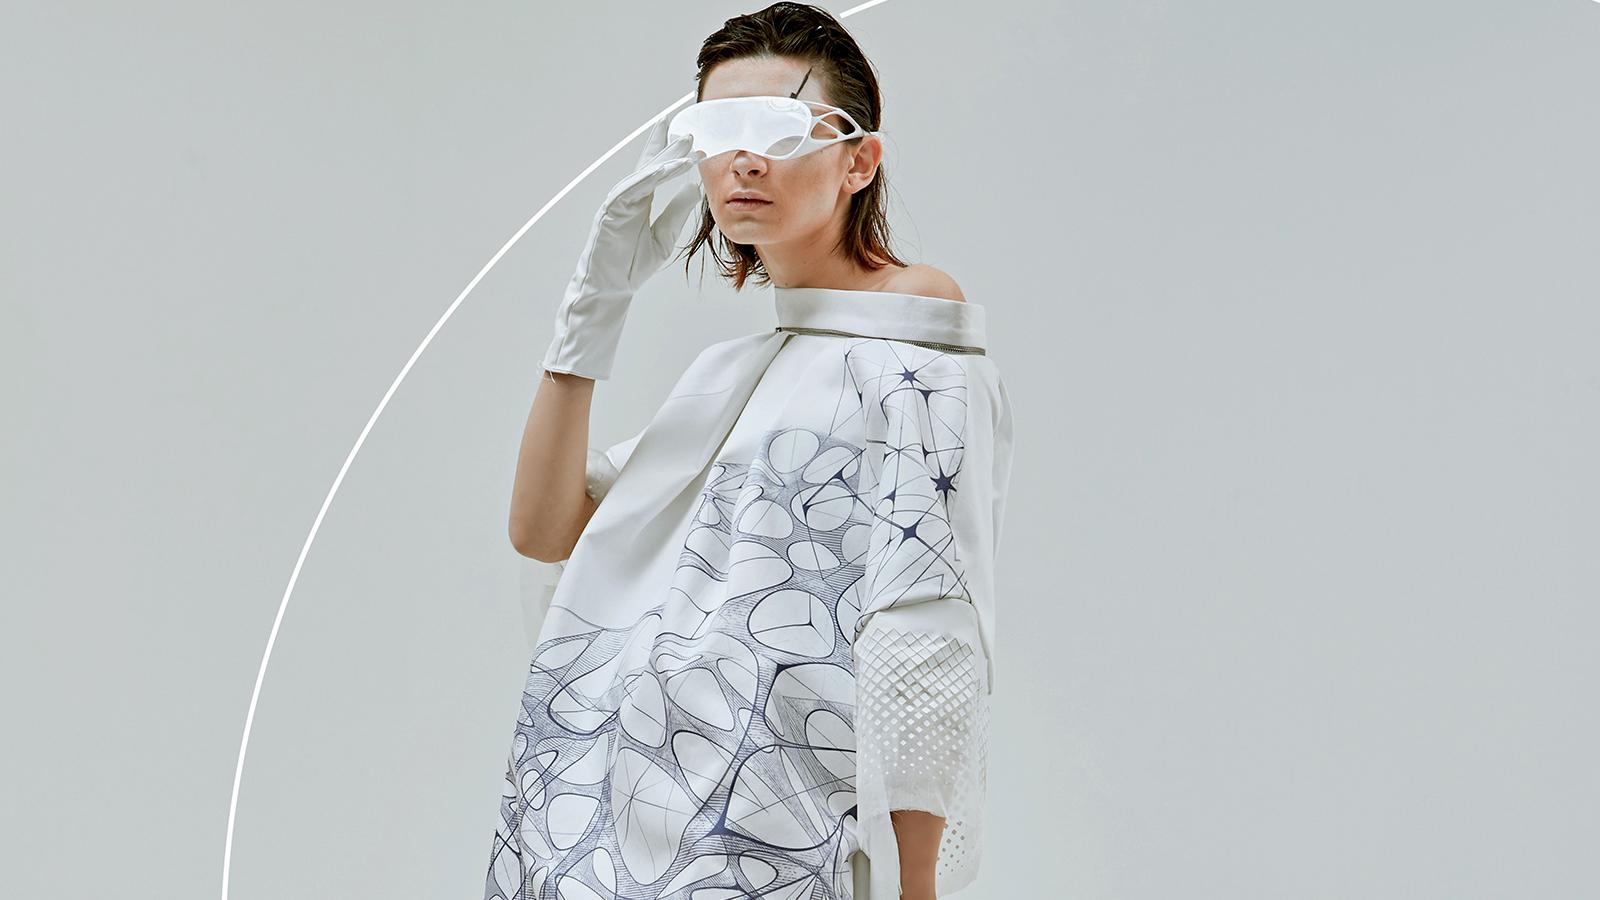 fashion business & digital marketing intensive